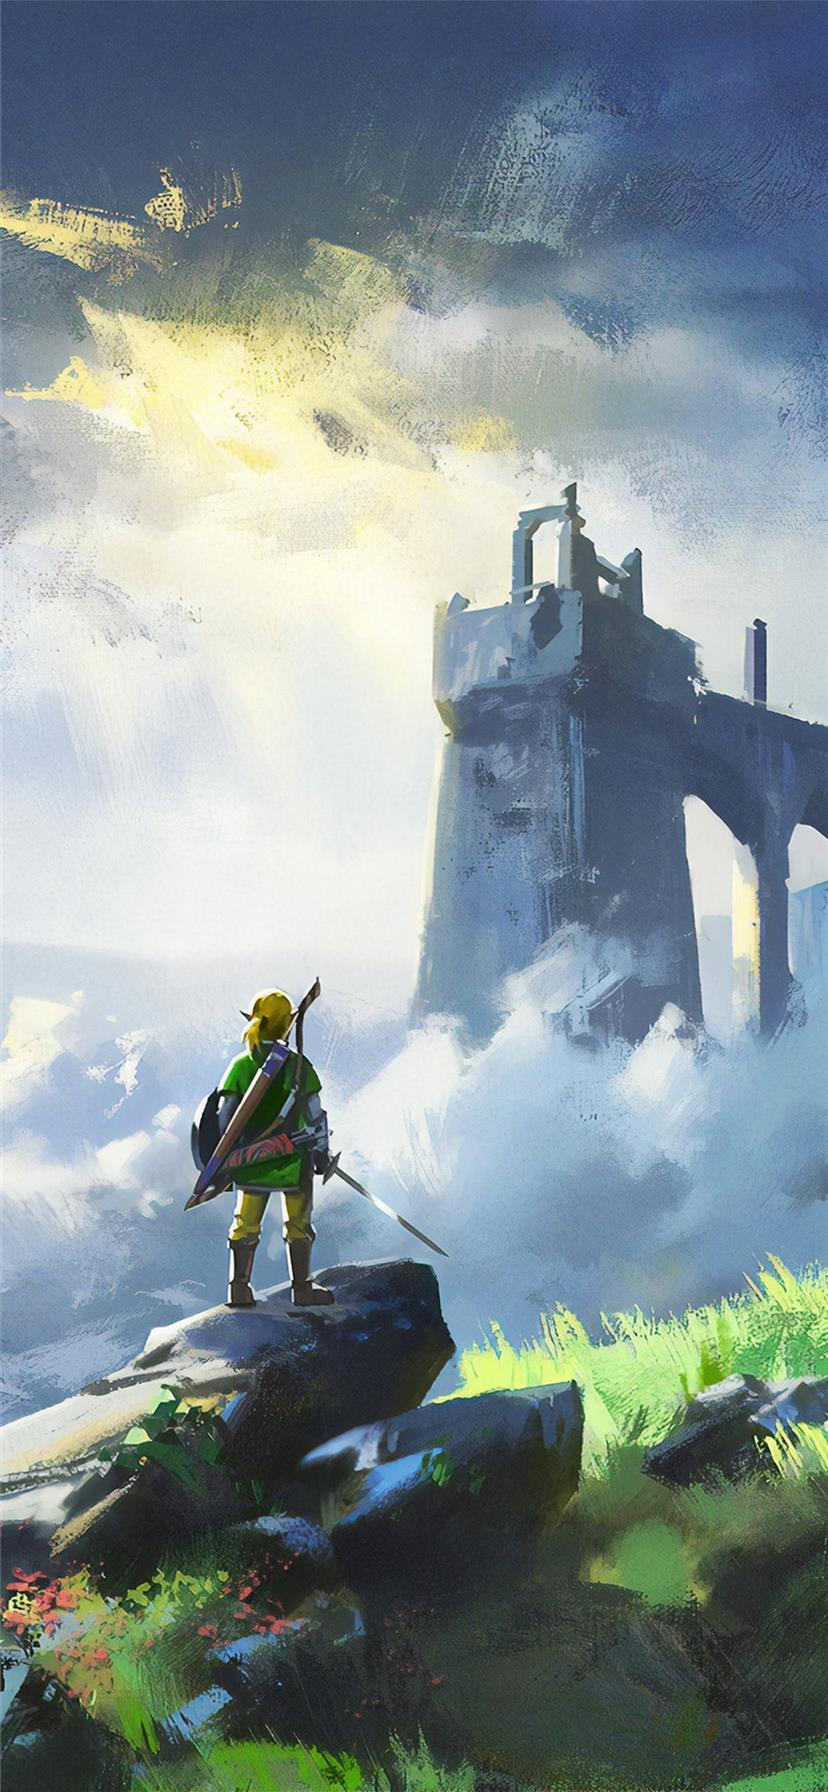 The Legend Of Zelda Breath Of Wild Game 4k Iphone X Wallpapers Free Download